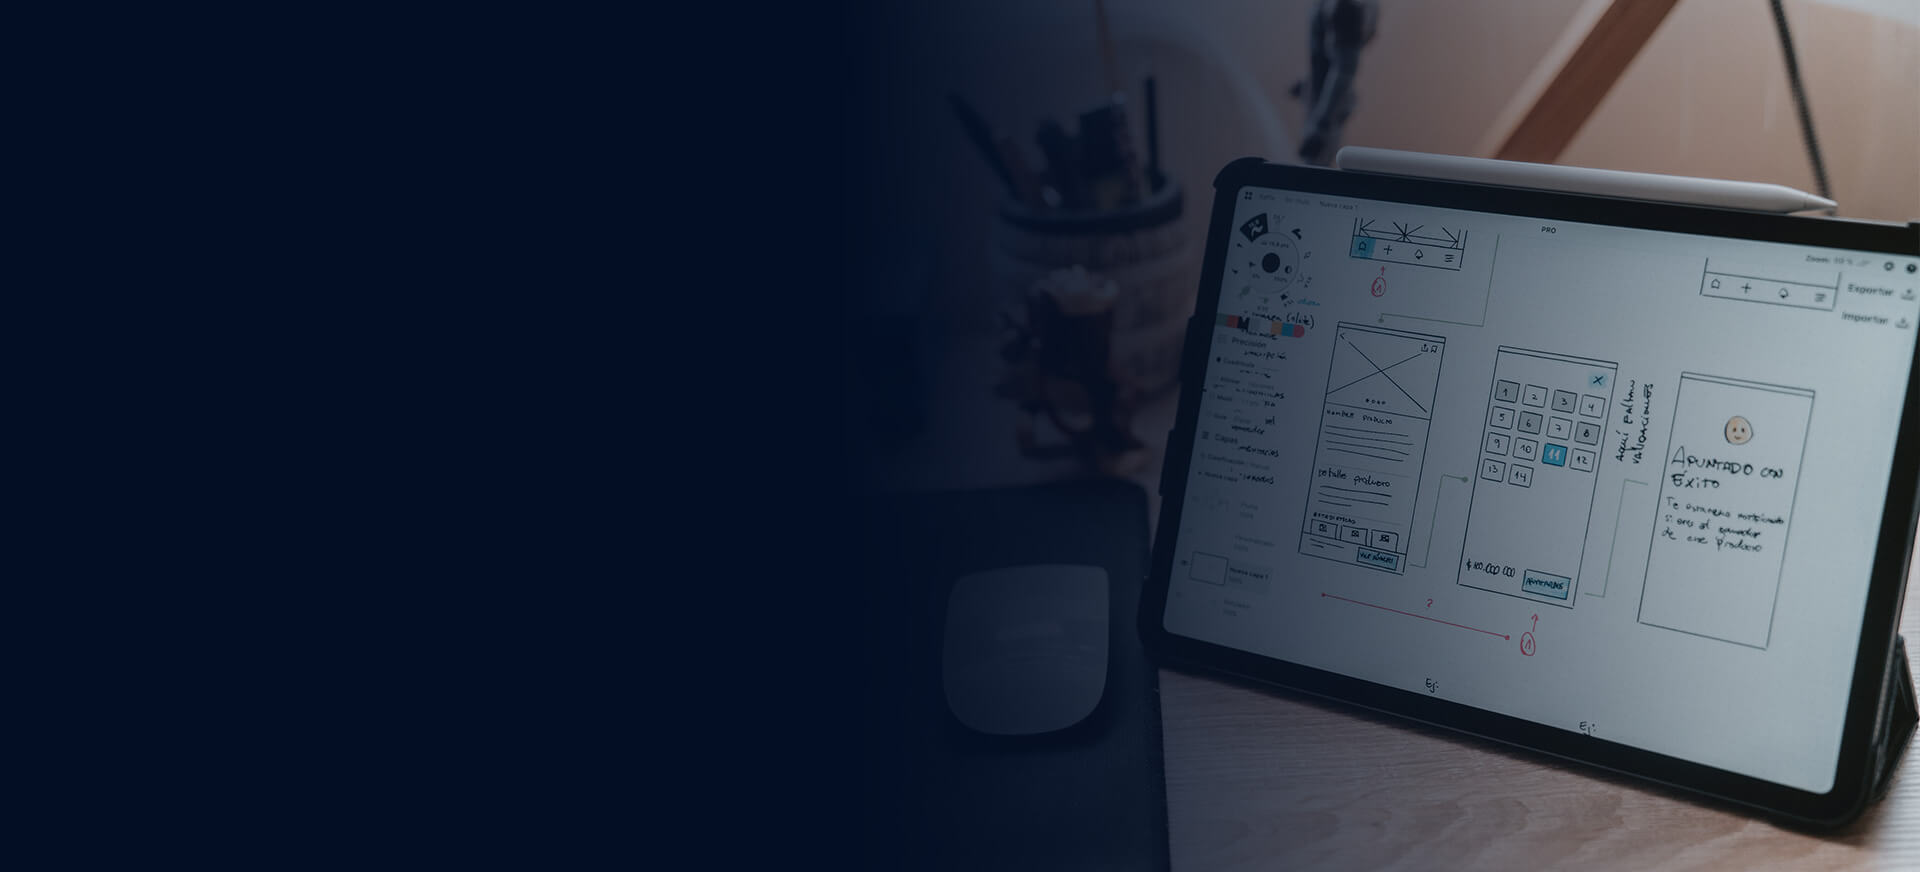 UX/UI Design and Development Services